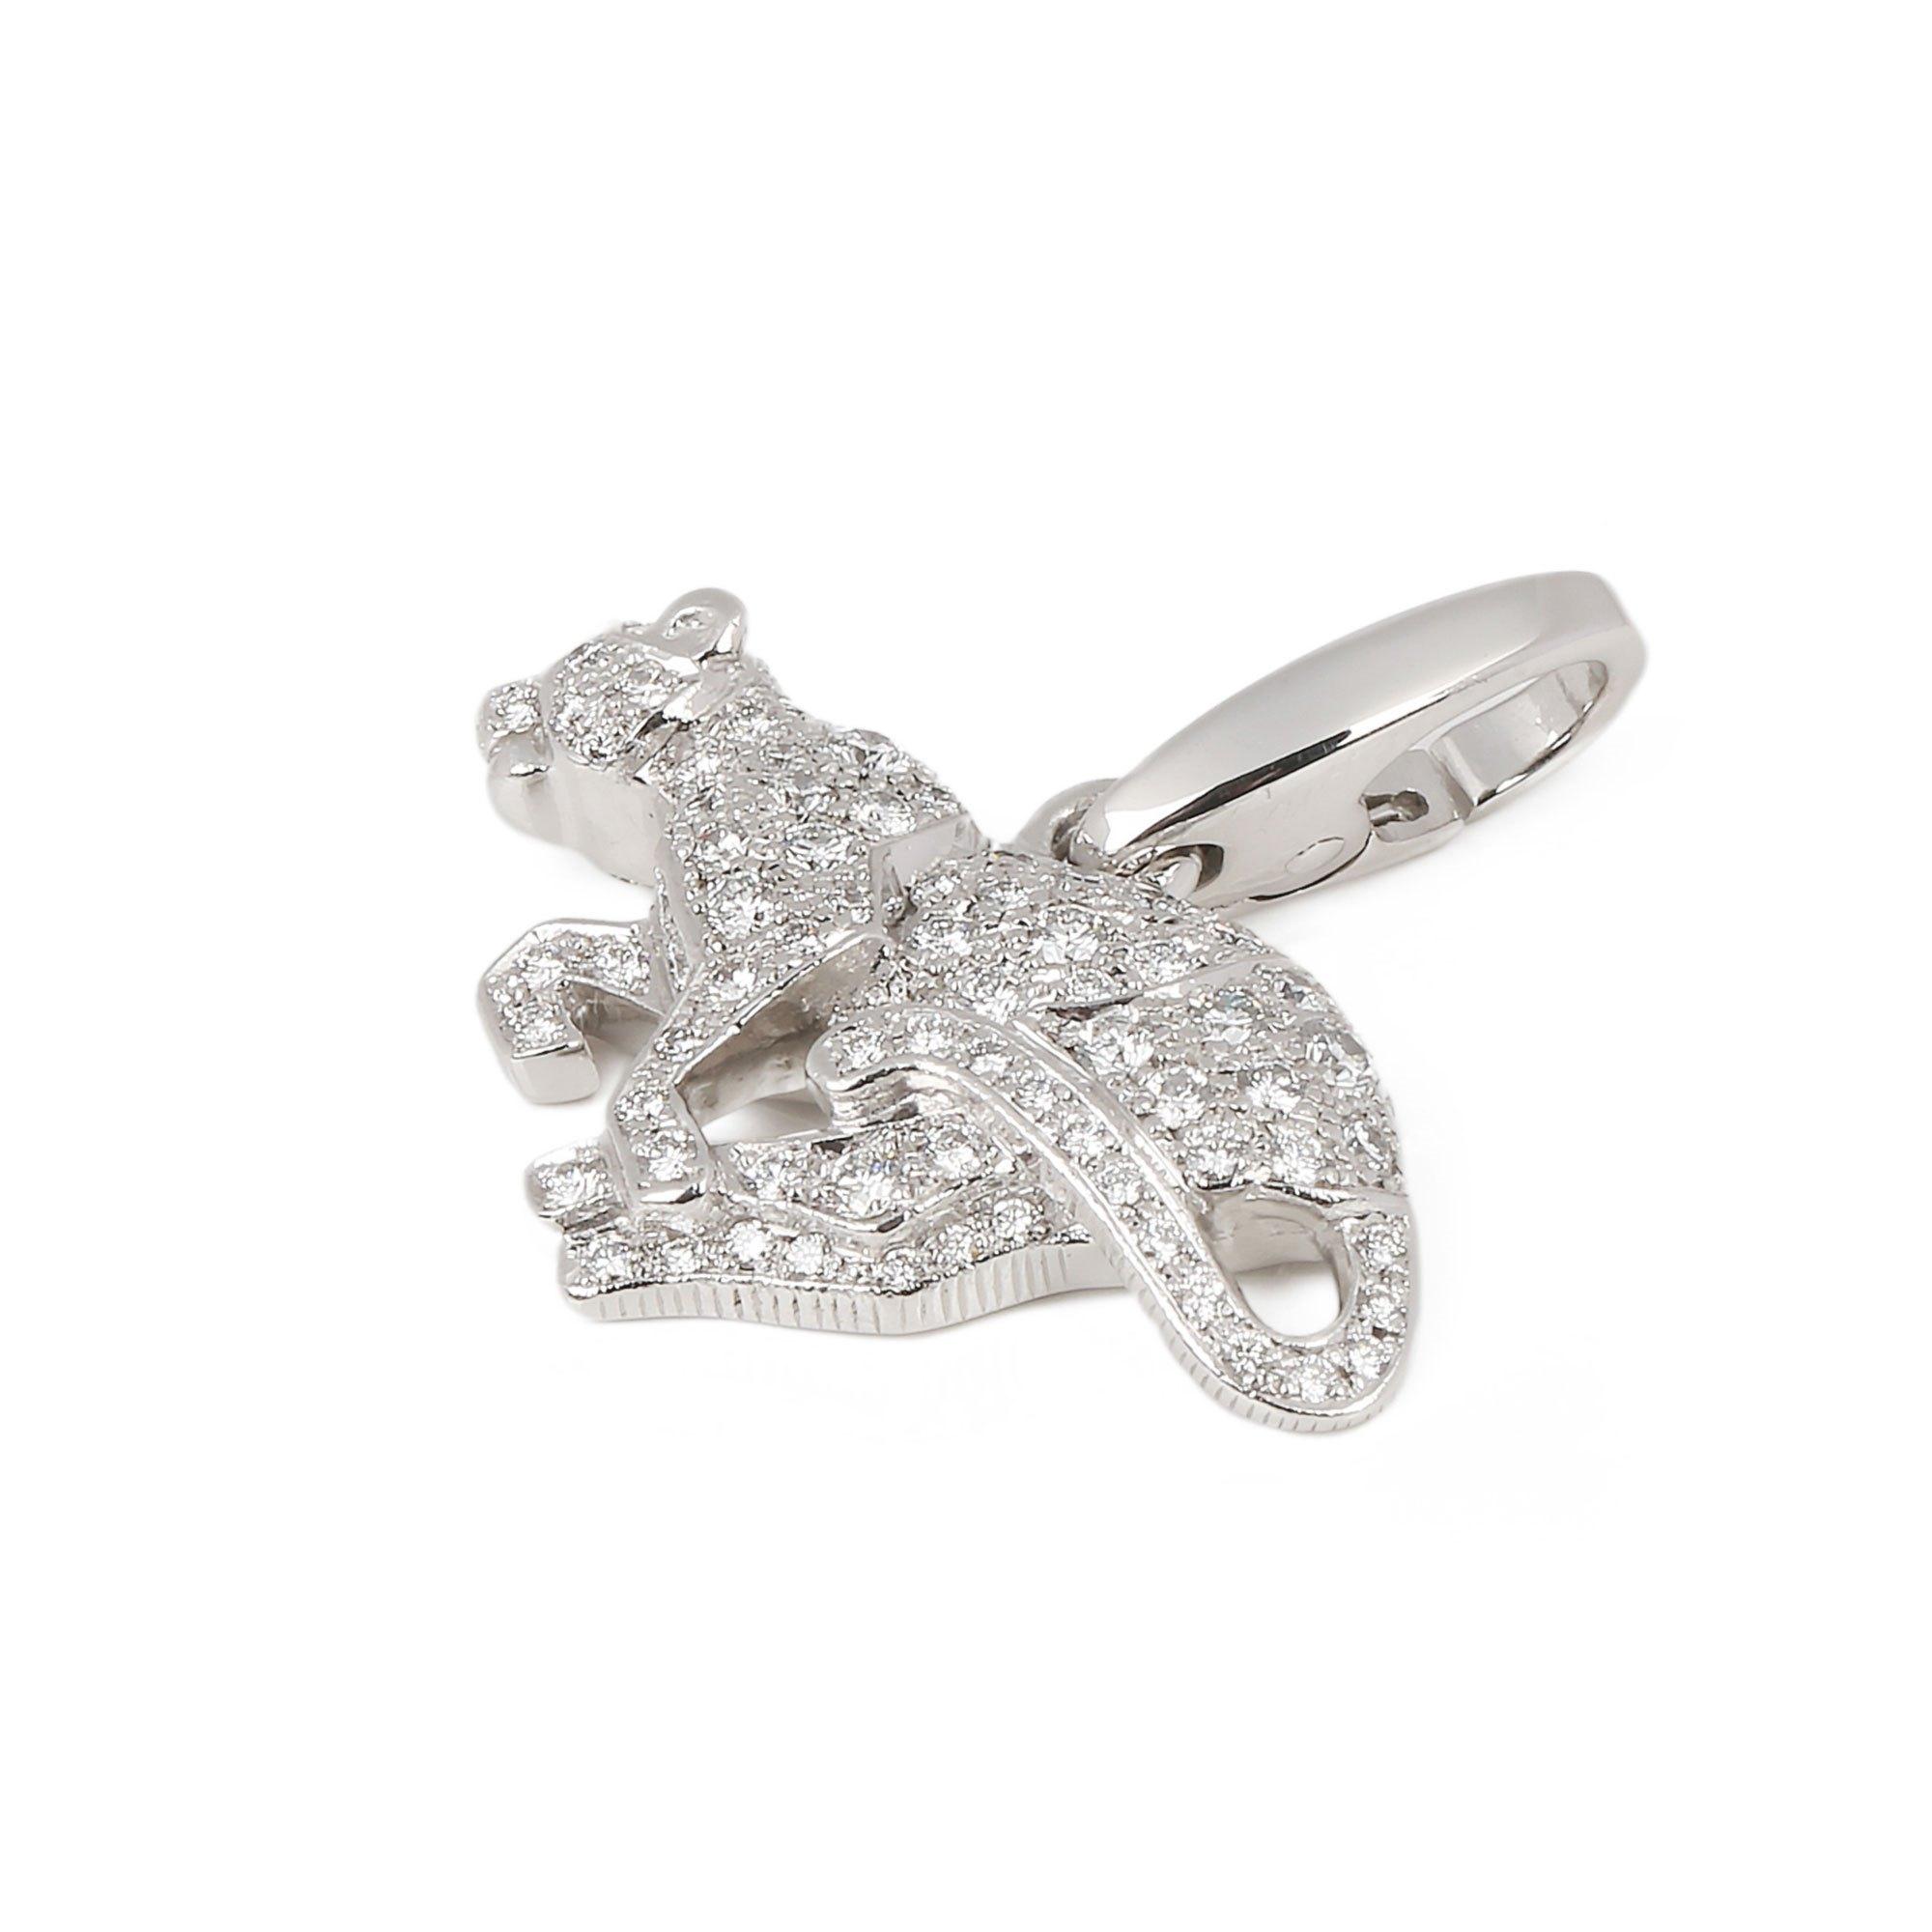 Cartier Diamond Panther Charm